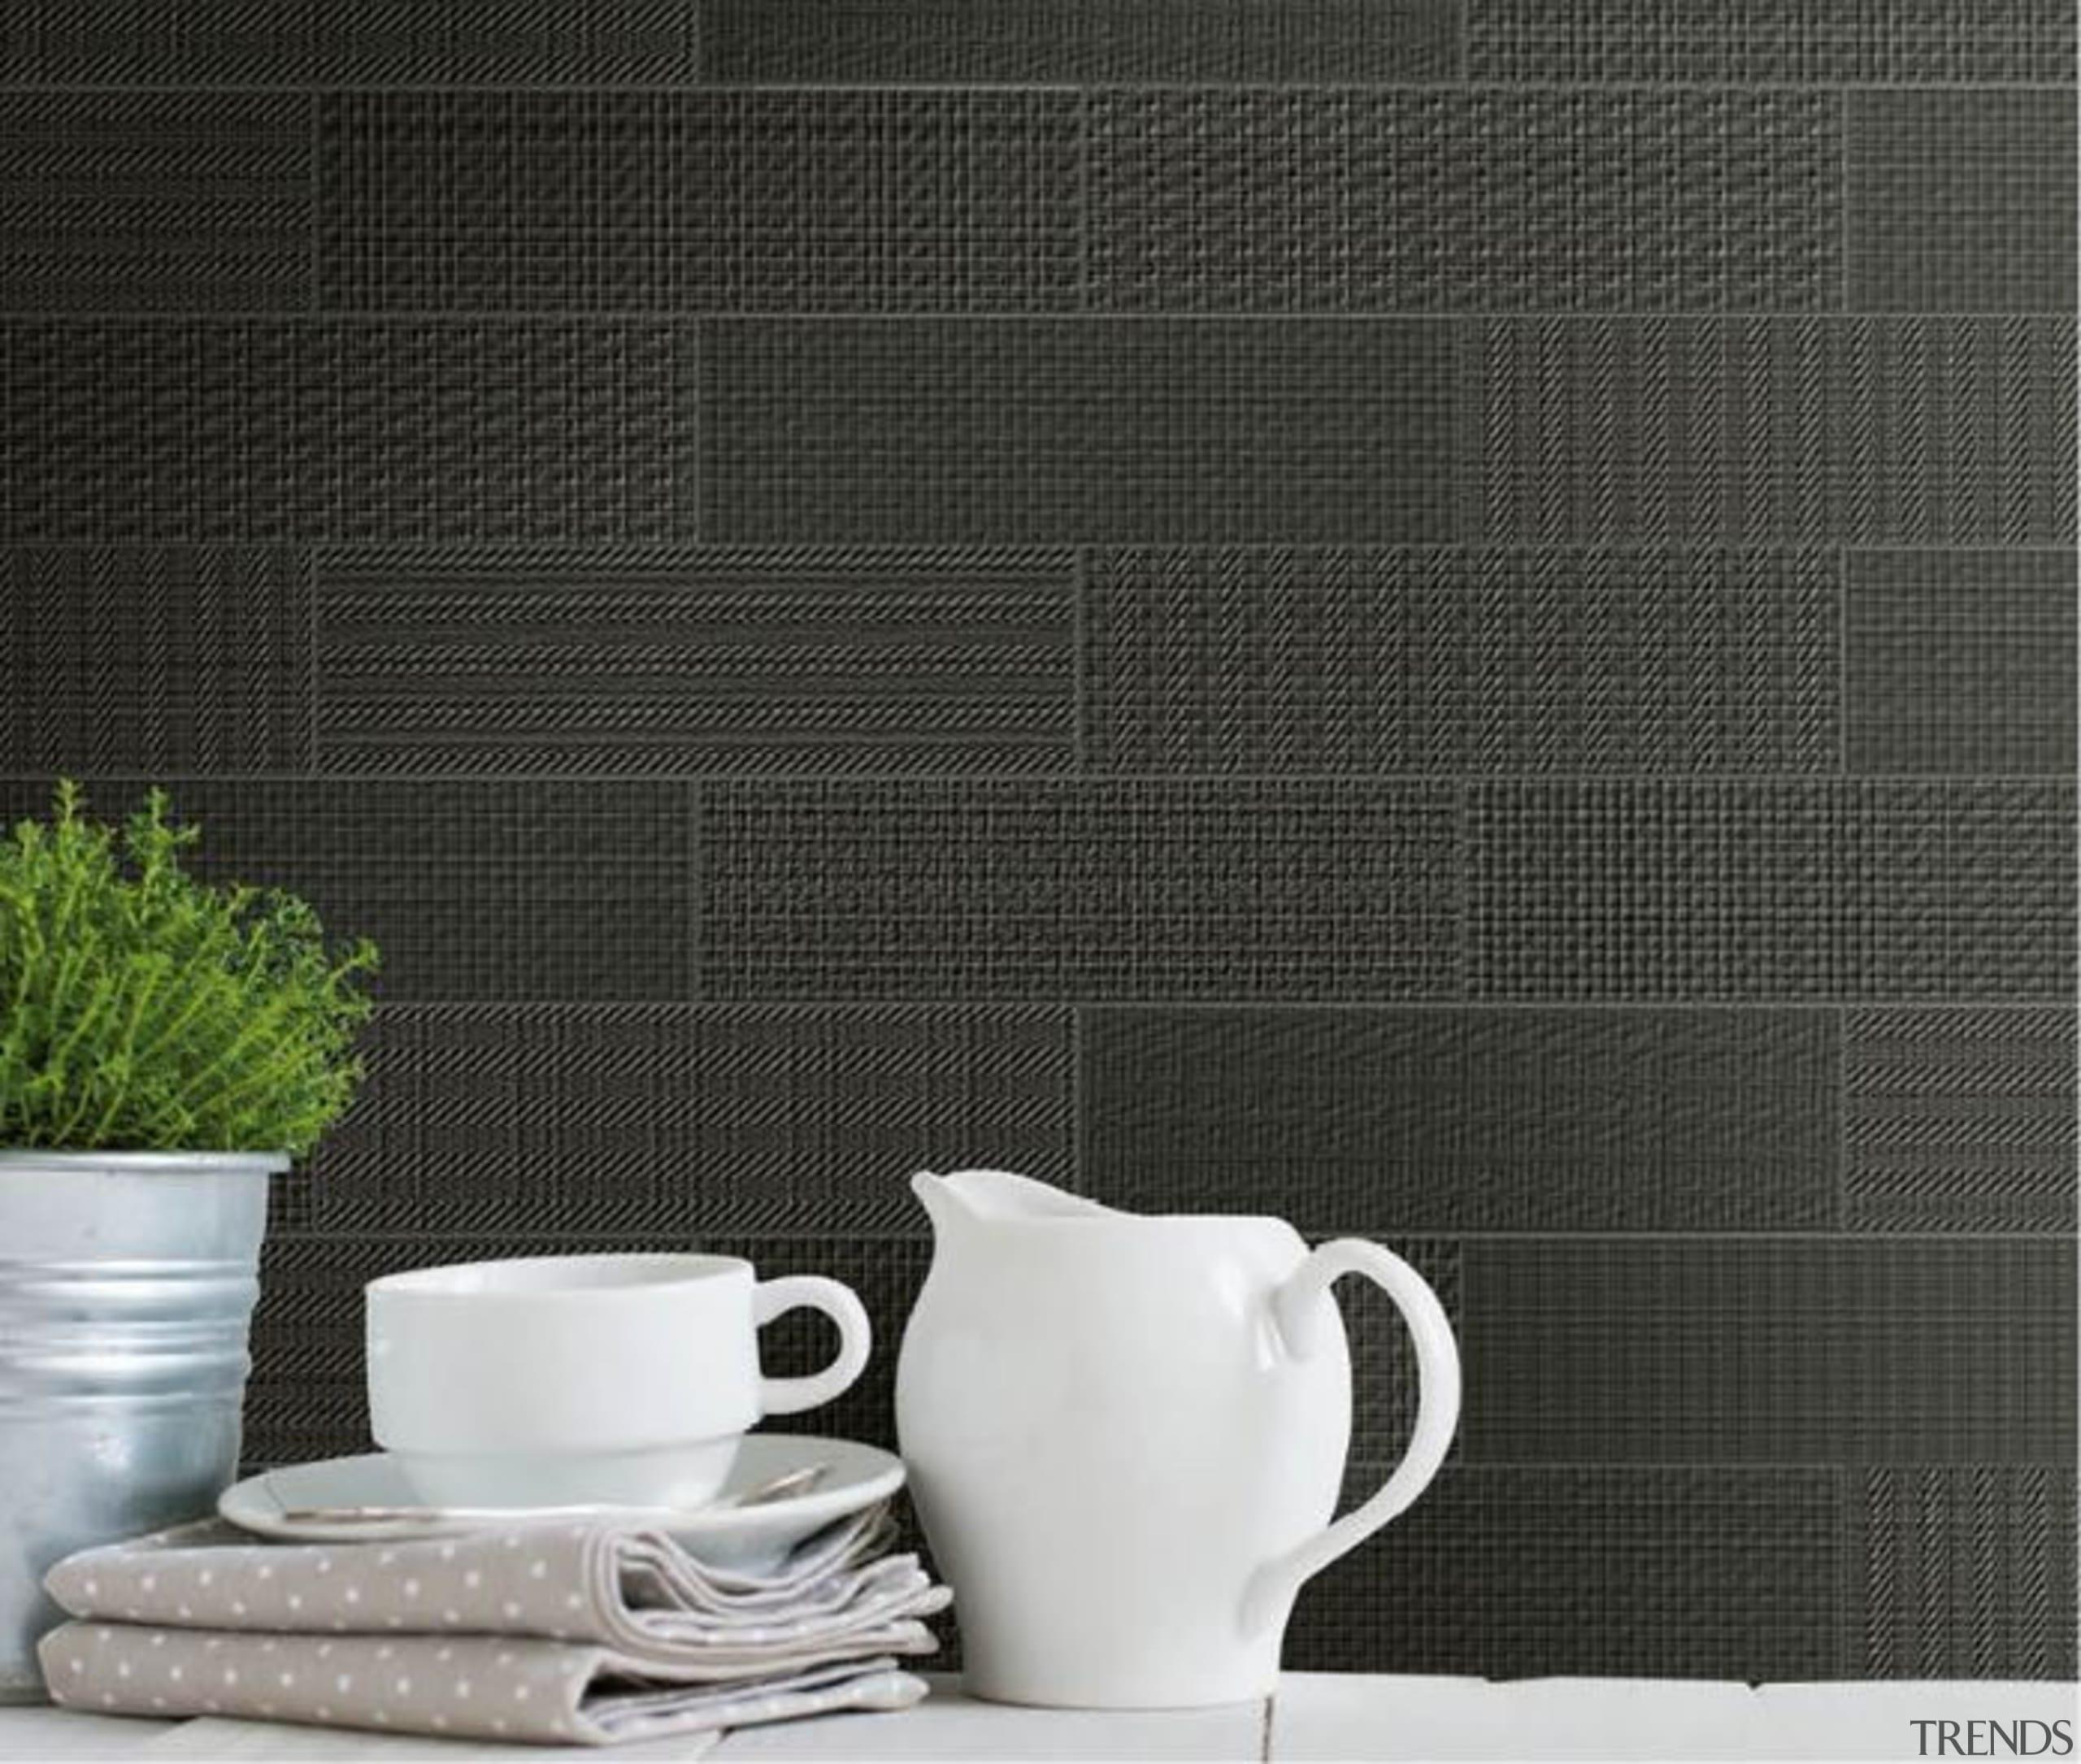 Brick Text Black 90x300 - Brick Text Black ceramic, coffee cup, cup, flooring, saucer, serveware, still life, still life photography, tableware, tap, teapot, tile, black